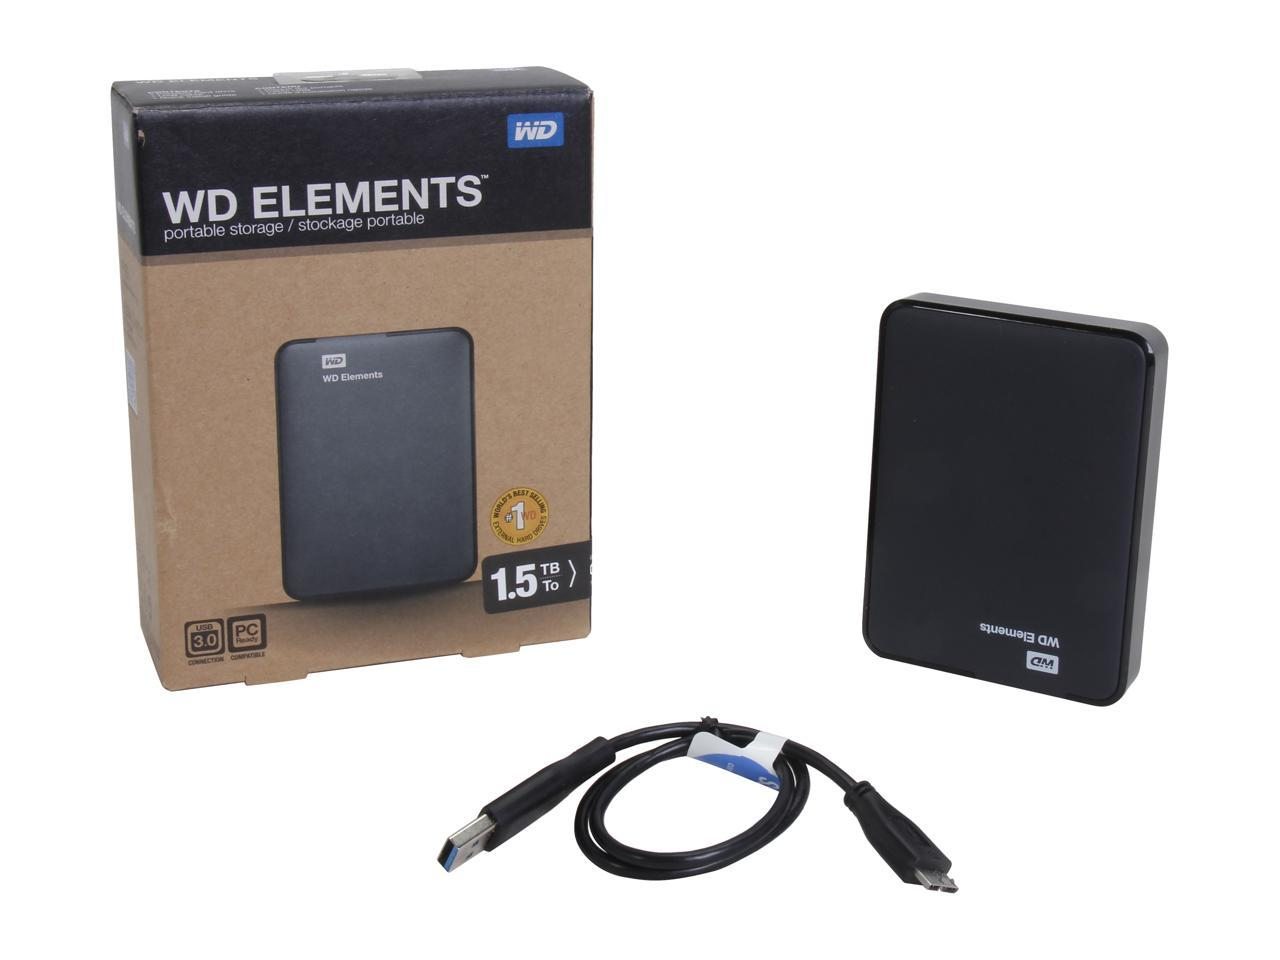 تصویر هارد اکسترنال وسترن دیجیتال مدل Element ظرفیت 320 گیگابایت Western Digital Elements External Hard Drive - 320GB